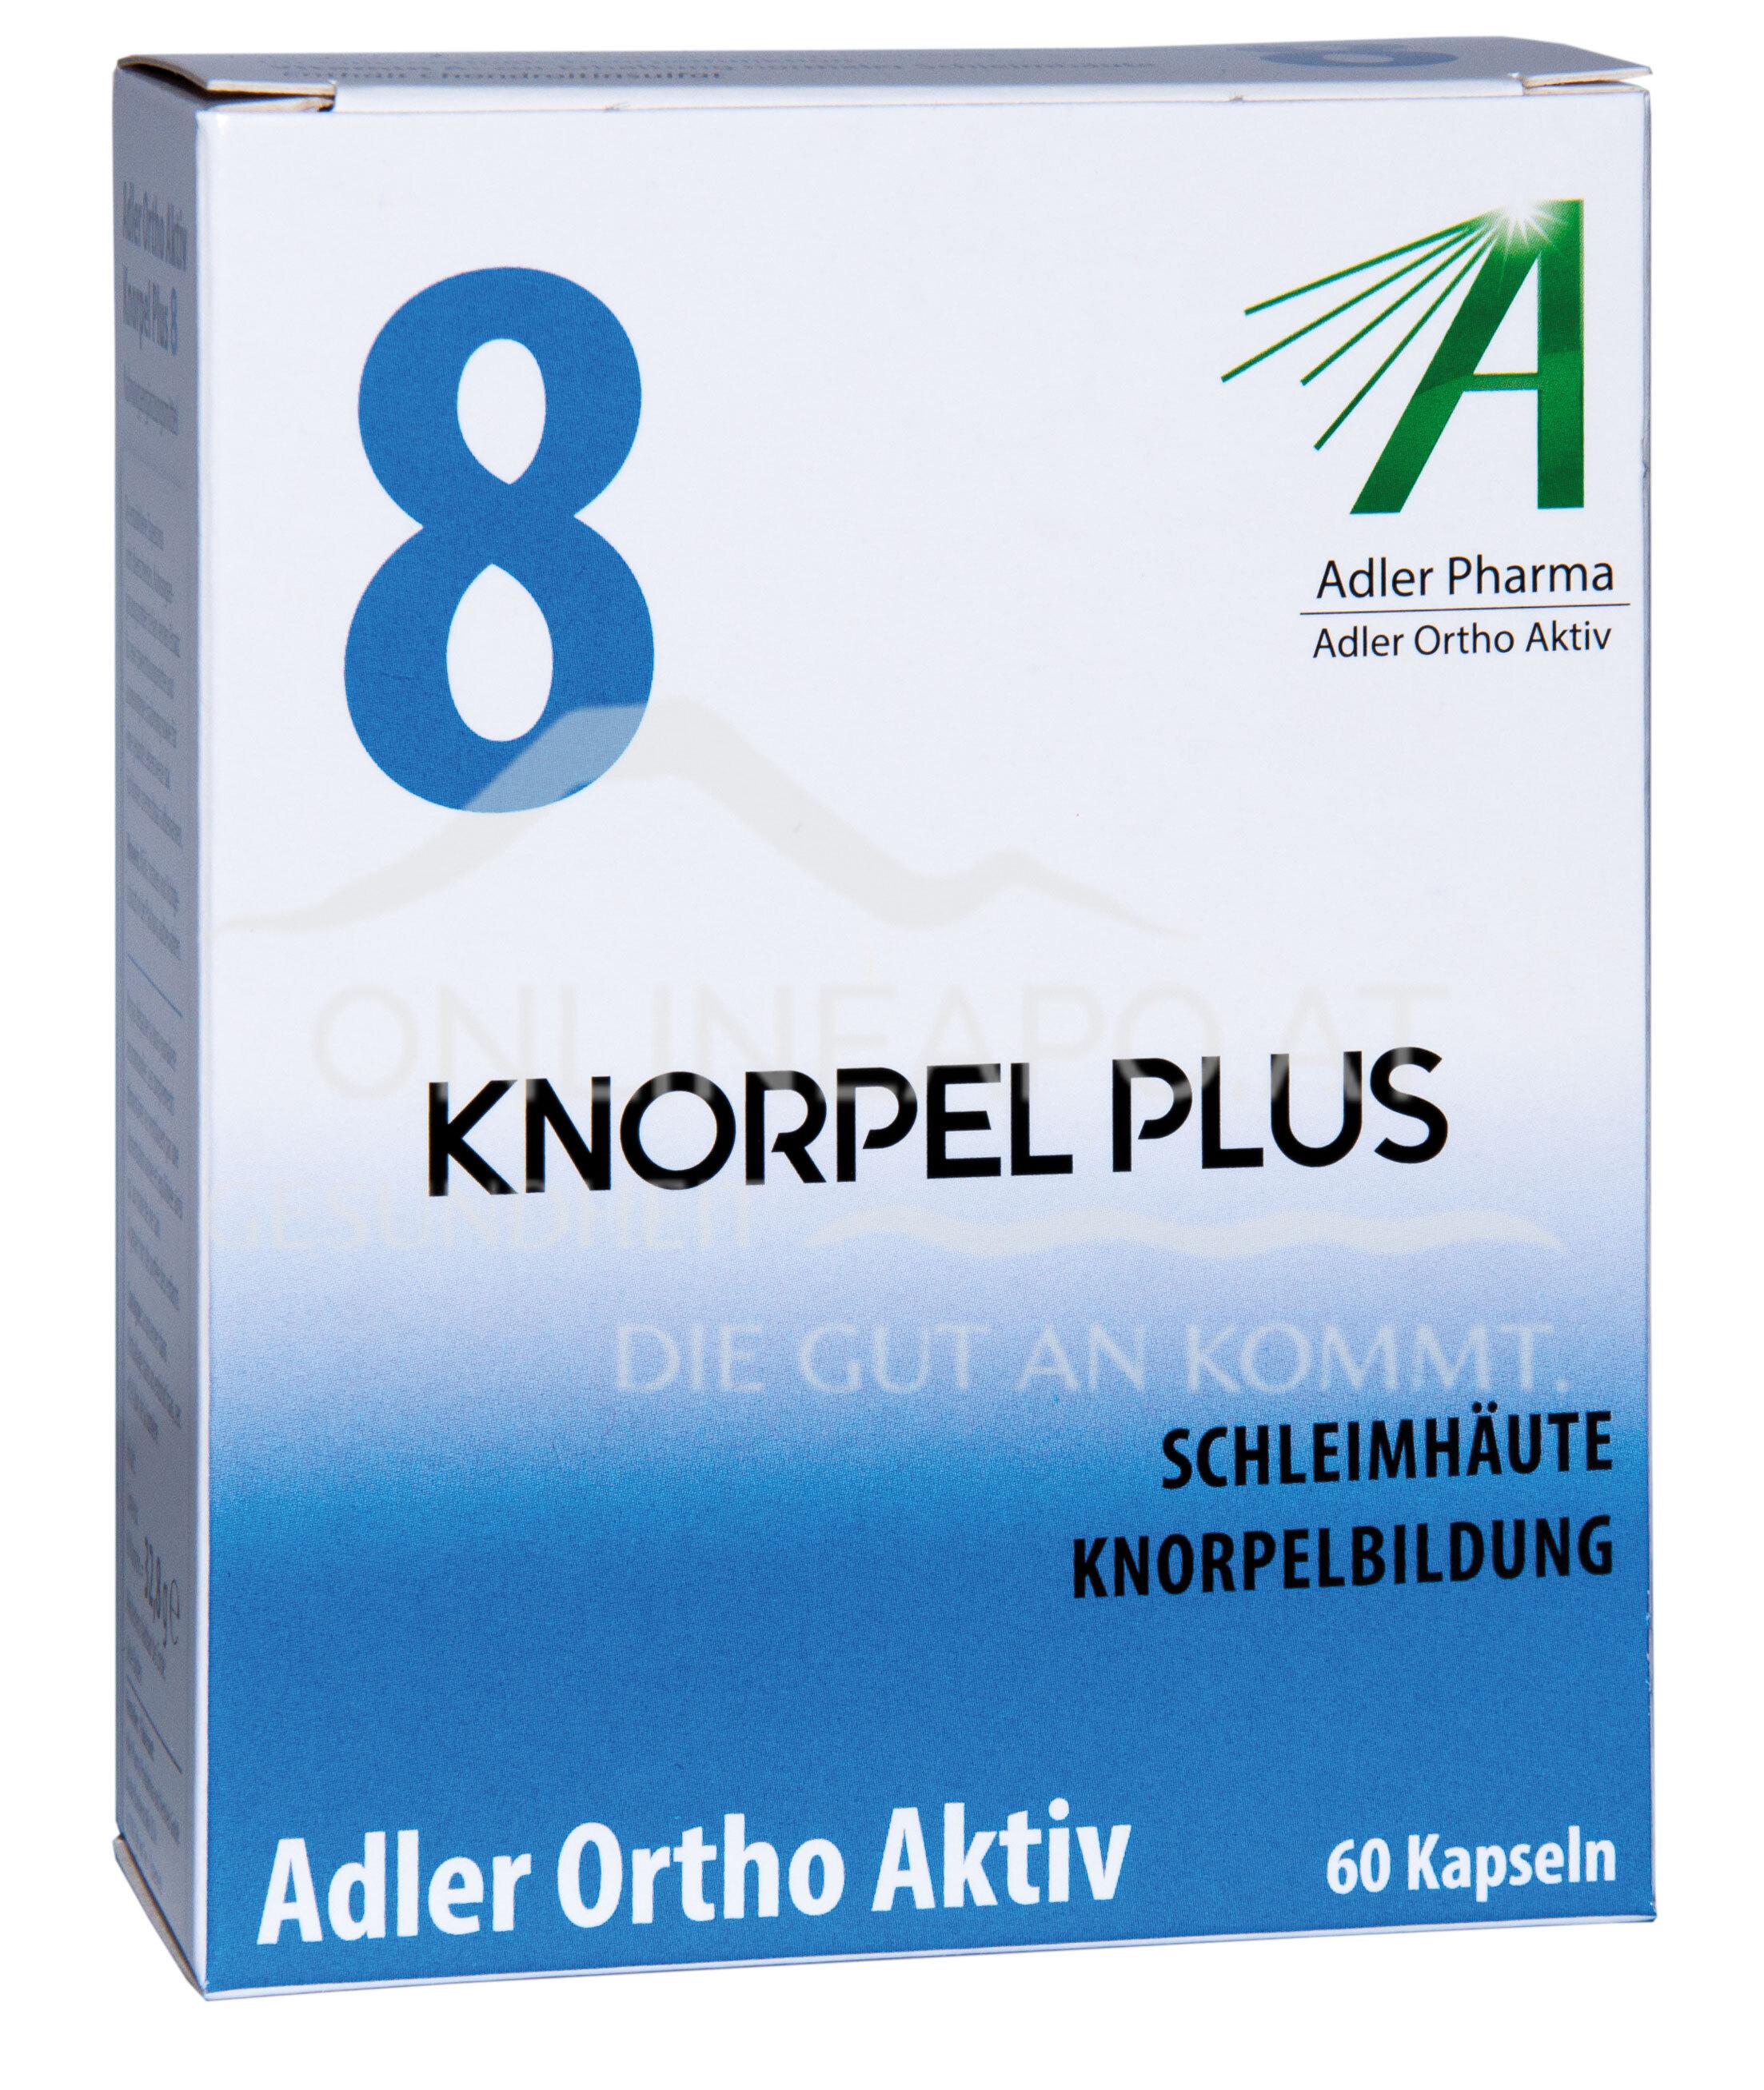 Adler Ortho Aktiv Nr. 8 Knorpel Plus